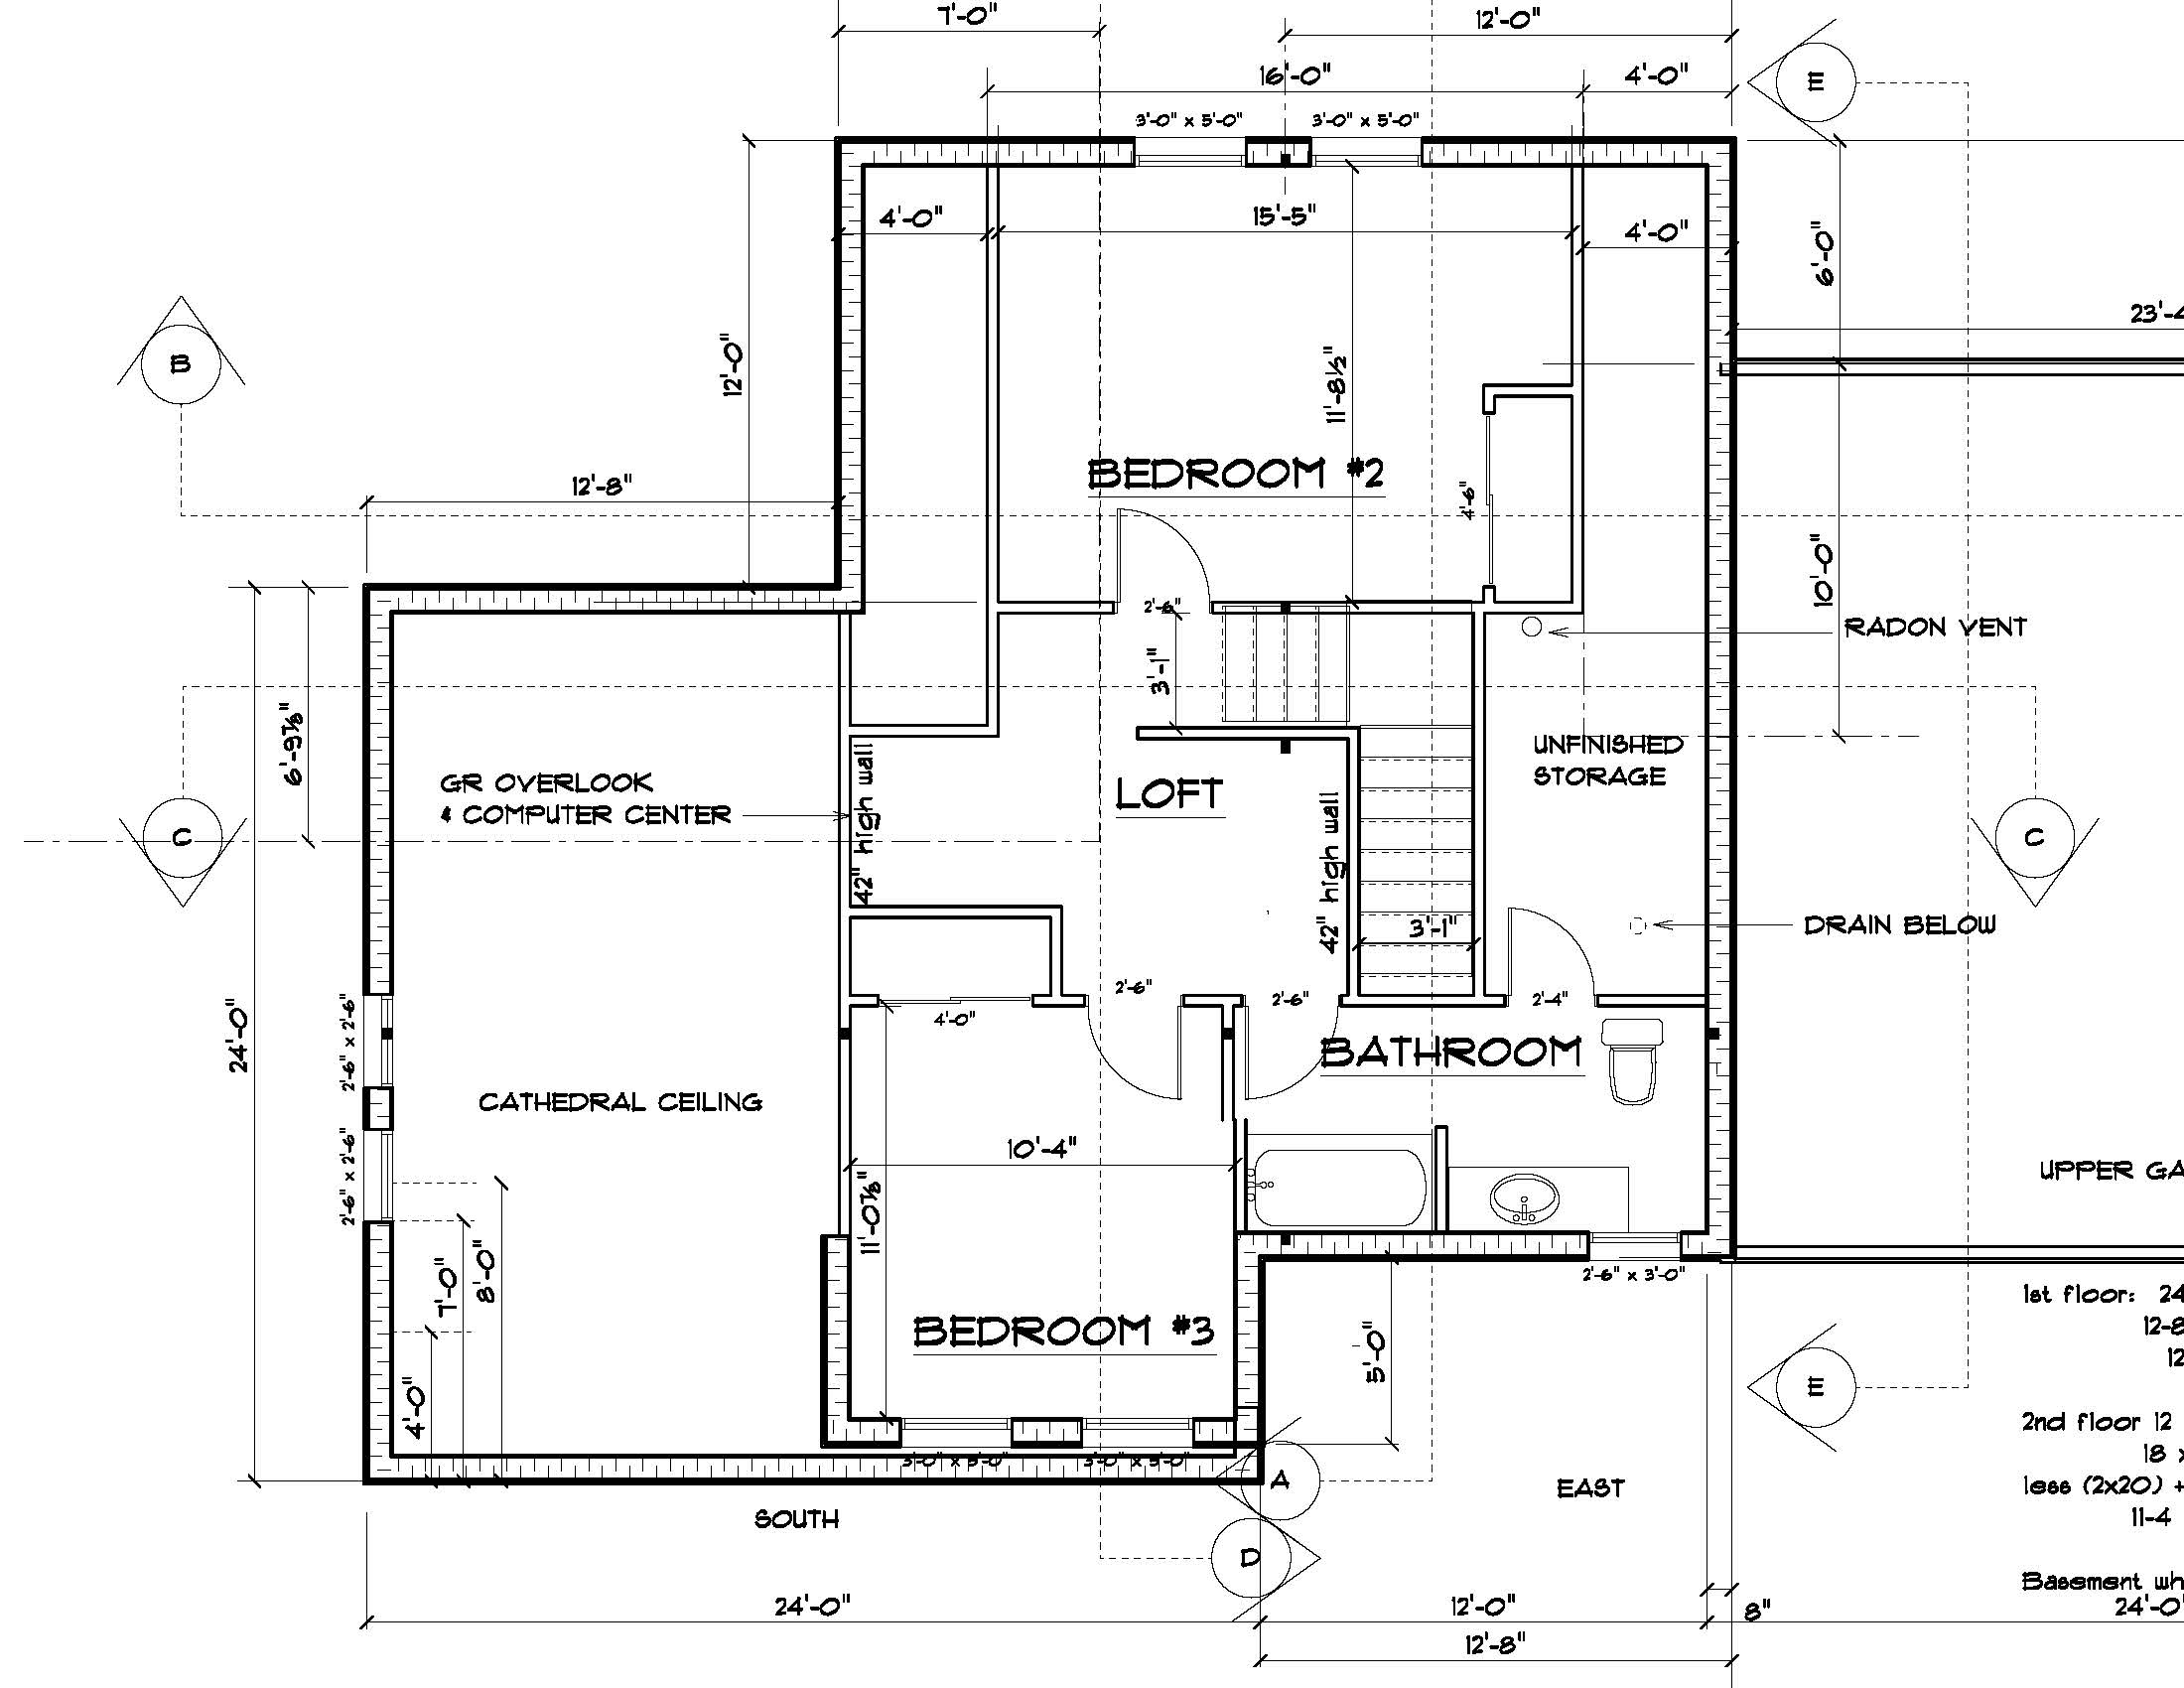 Sample Floor Plan 1